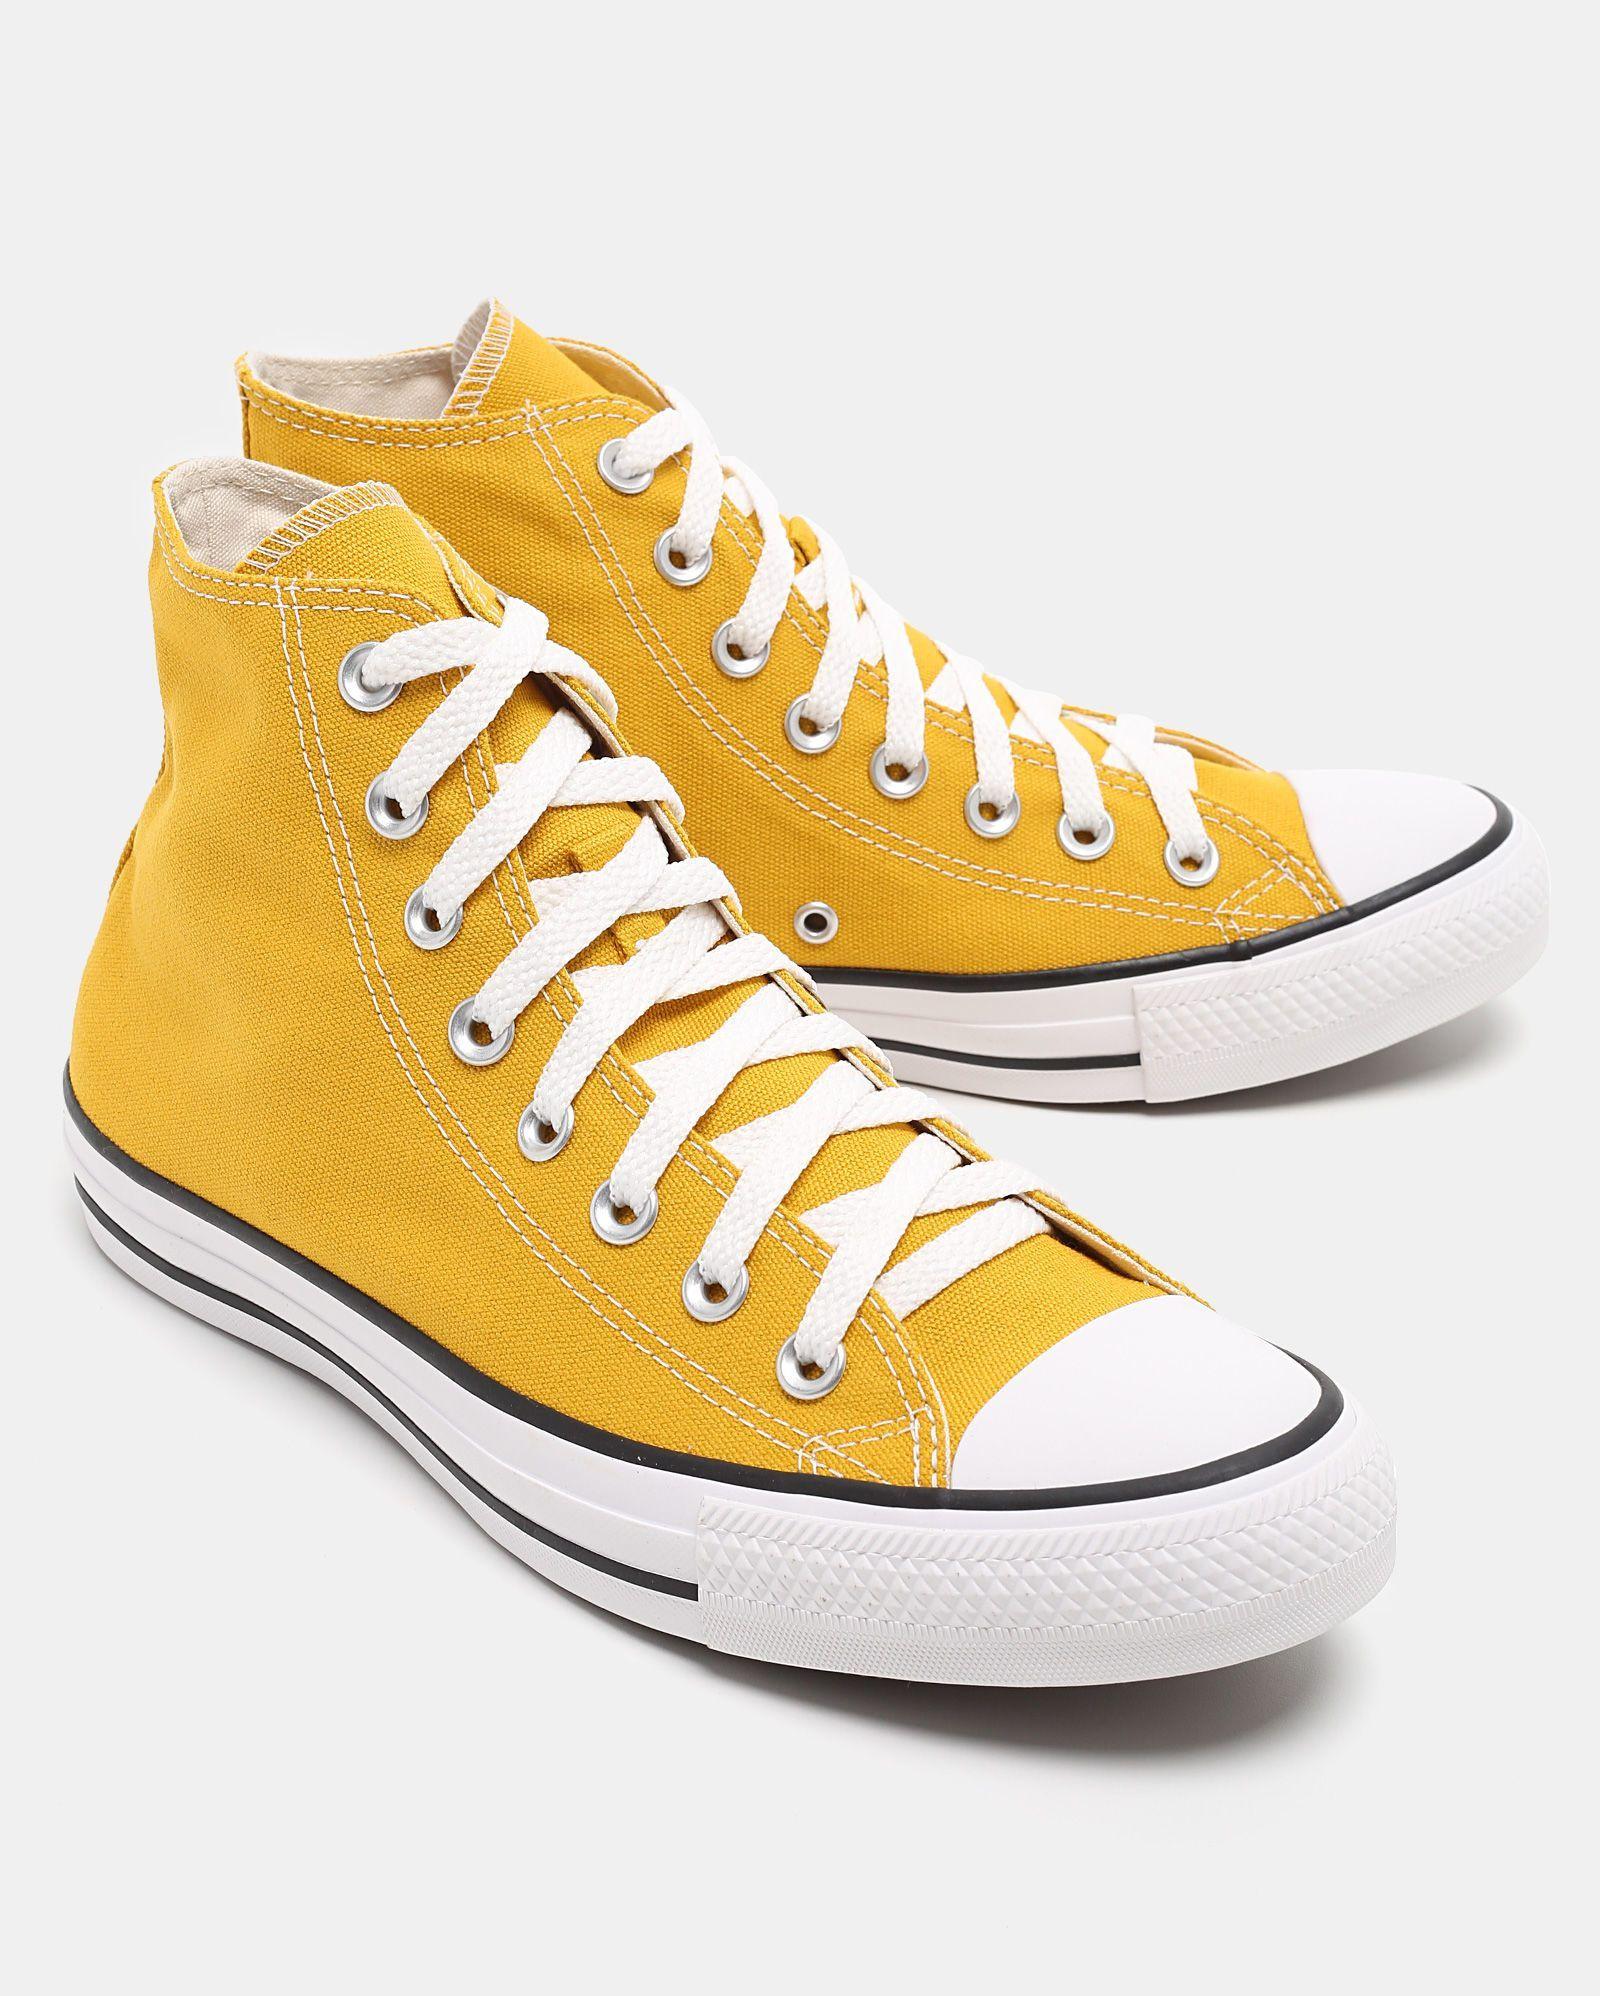 f00ecddef32 Tênis Converse All Star Chuck Taylor Cano Alto Amarelo